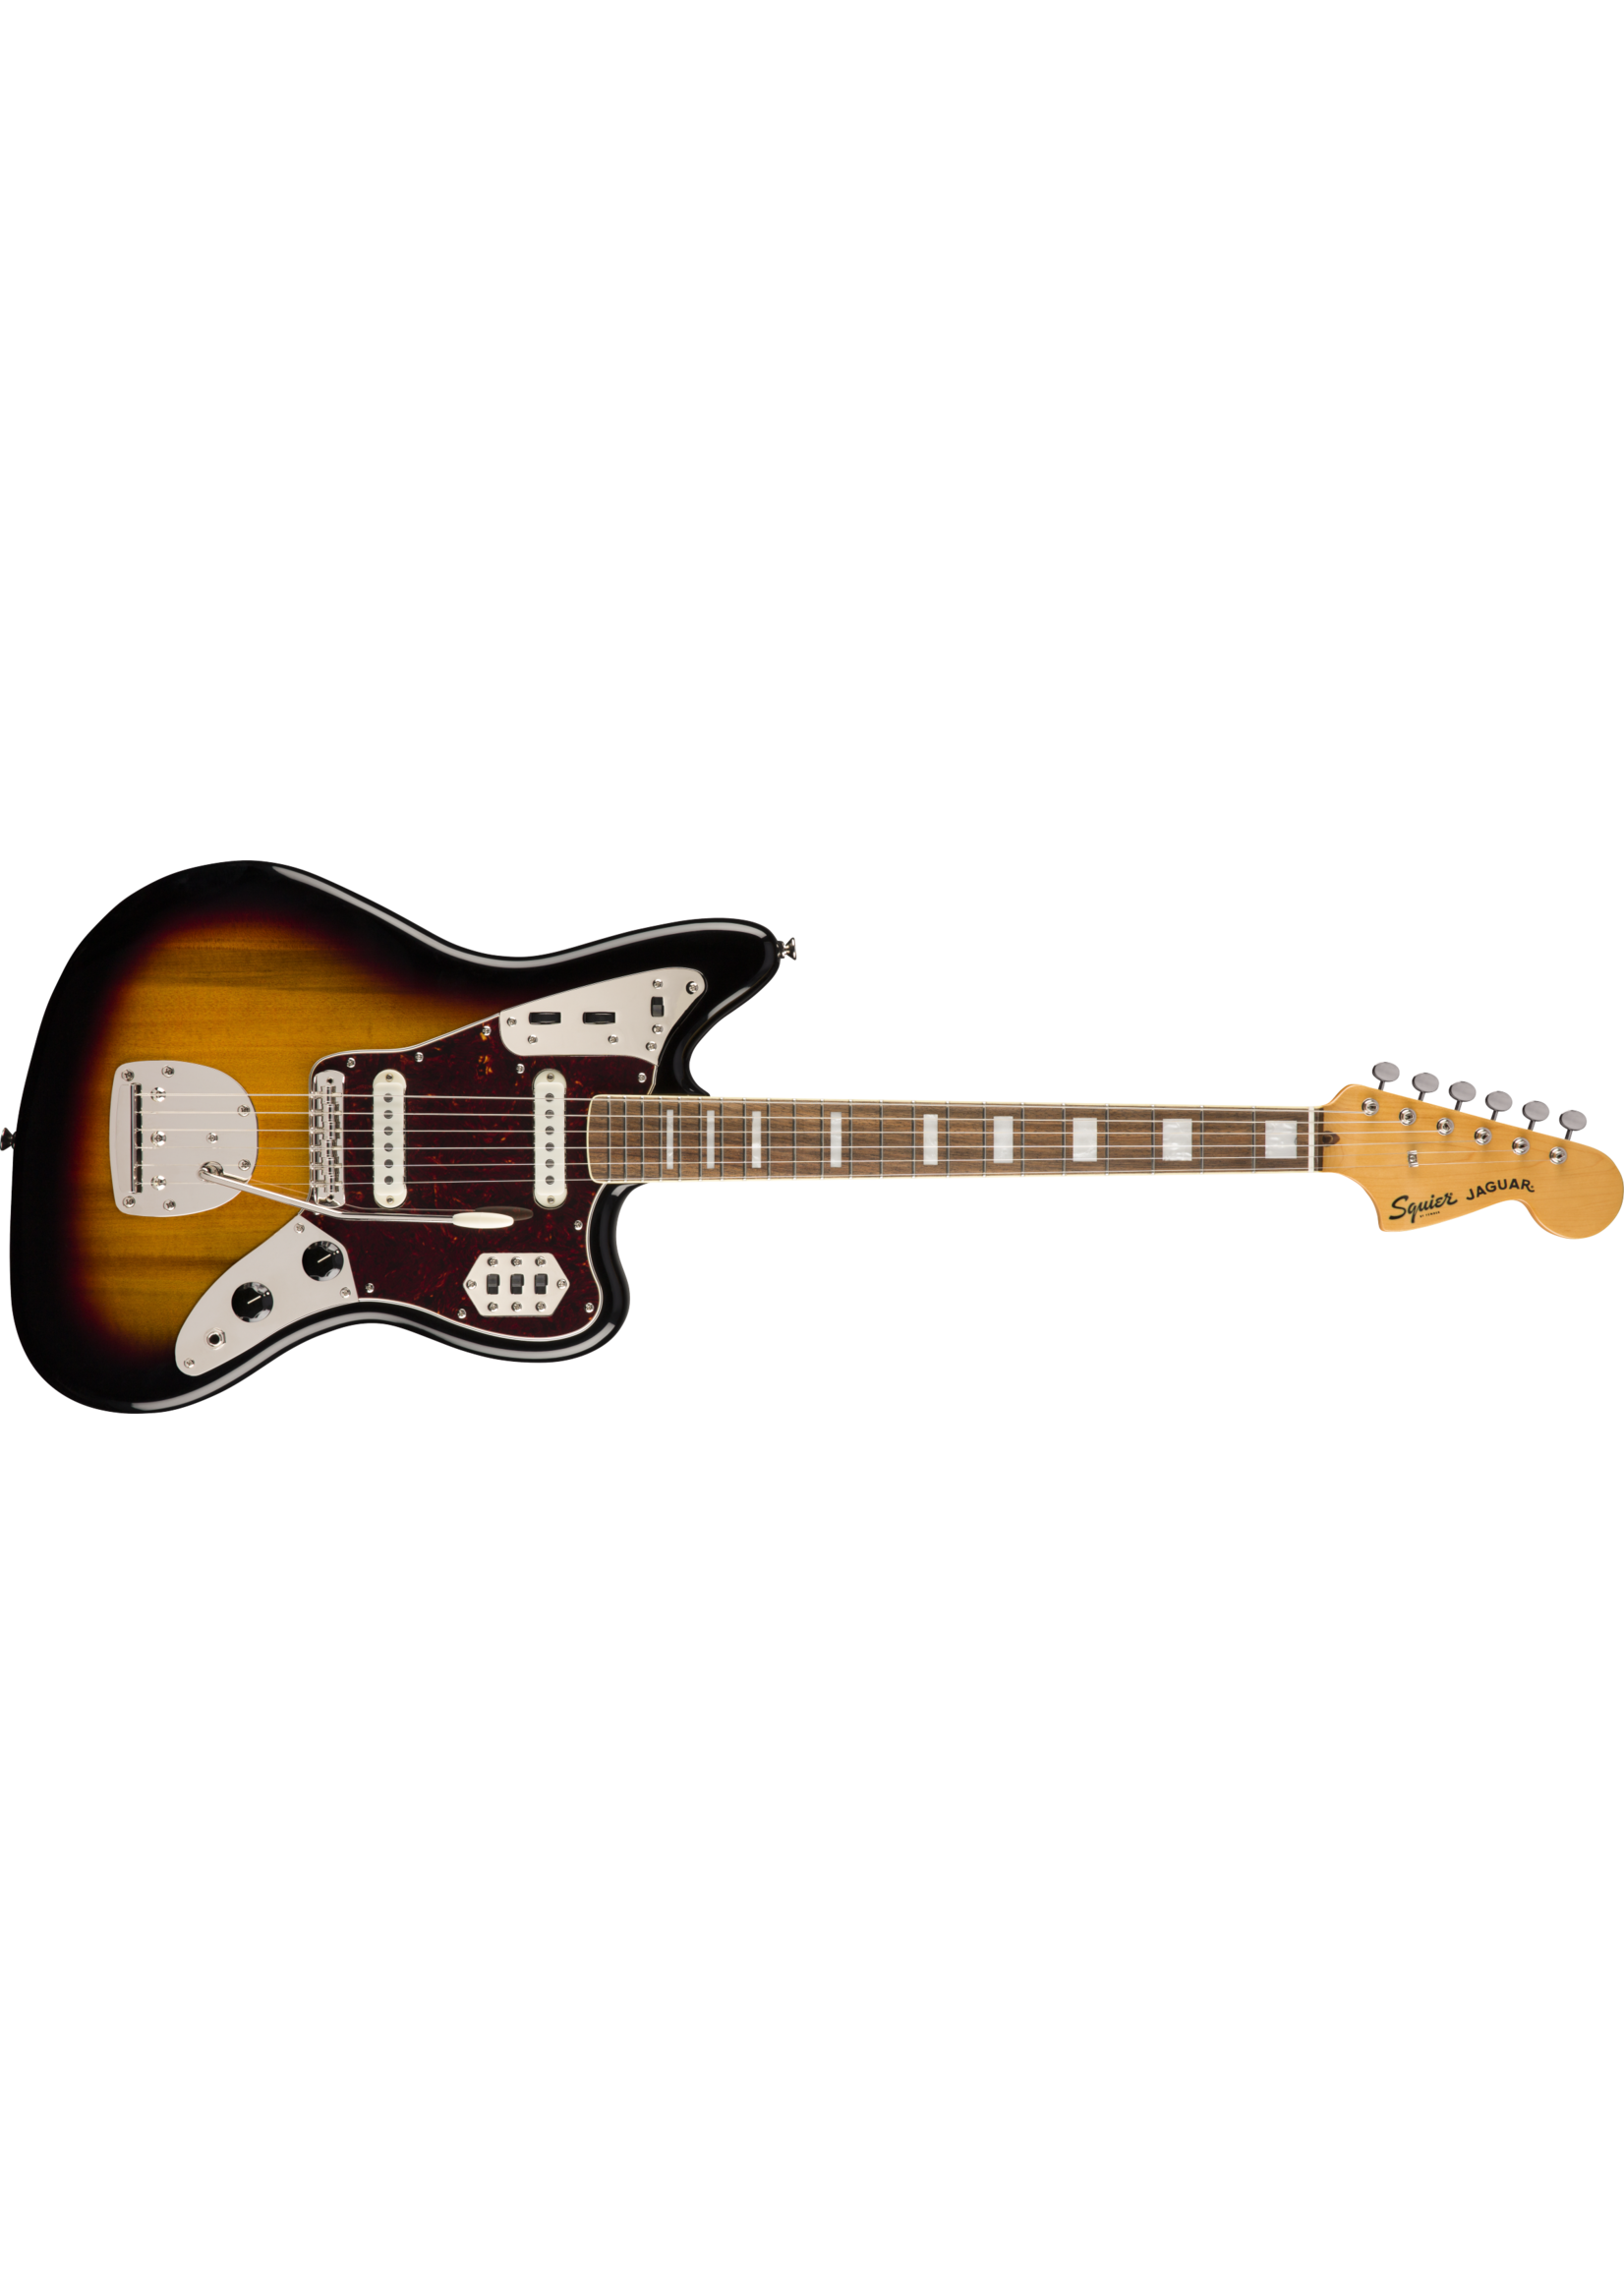 Squier Squier Classic Vibe '70s Jaguar LRL Laurel Fingerboard Sunburst